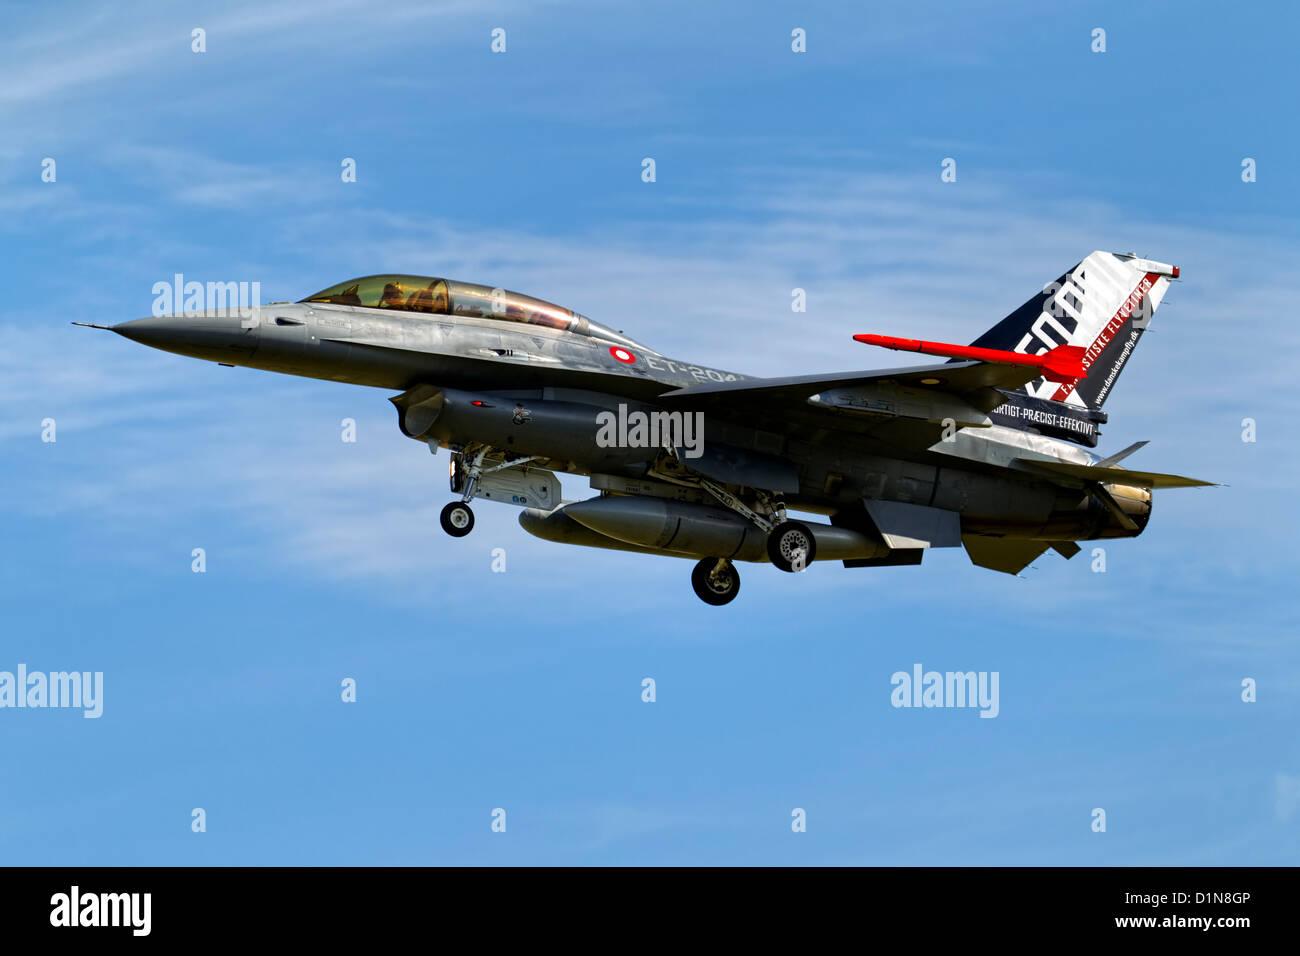 General Dynamics (SABCA) F-16BM Fighting Falcon (401) ET 204 Danish Air Force lands at RNAS Yeovilton International - Stock Image